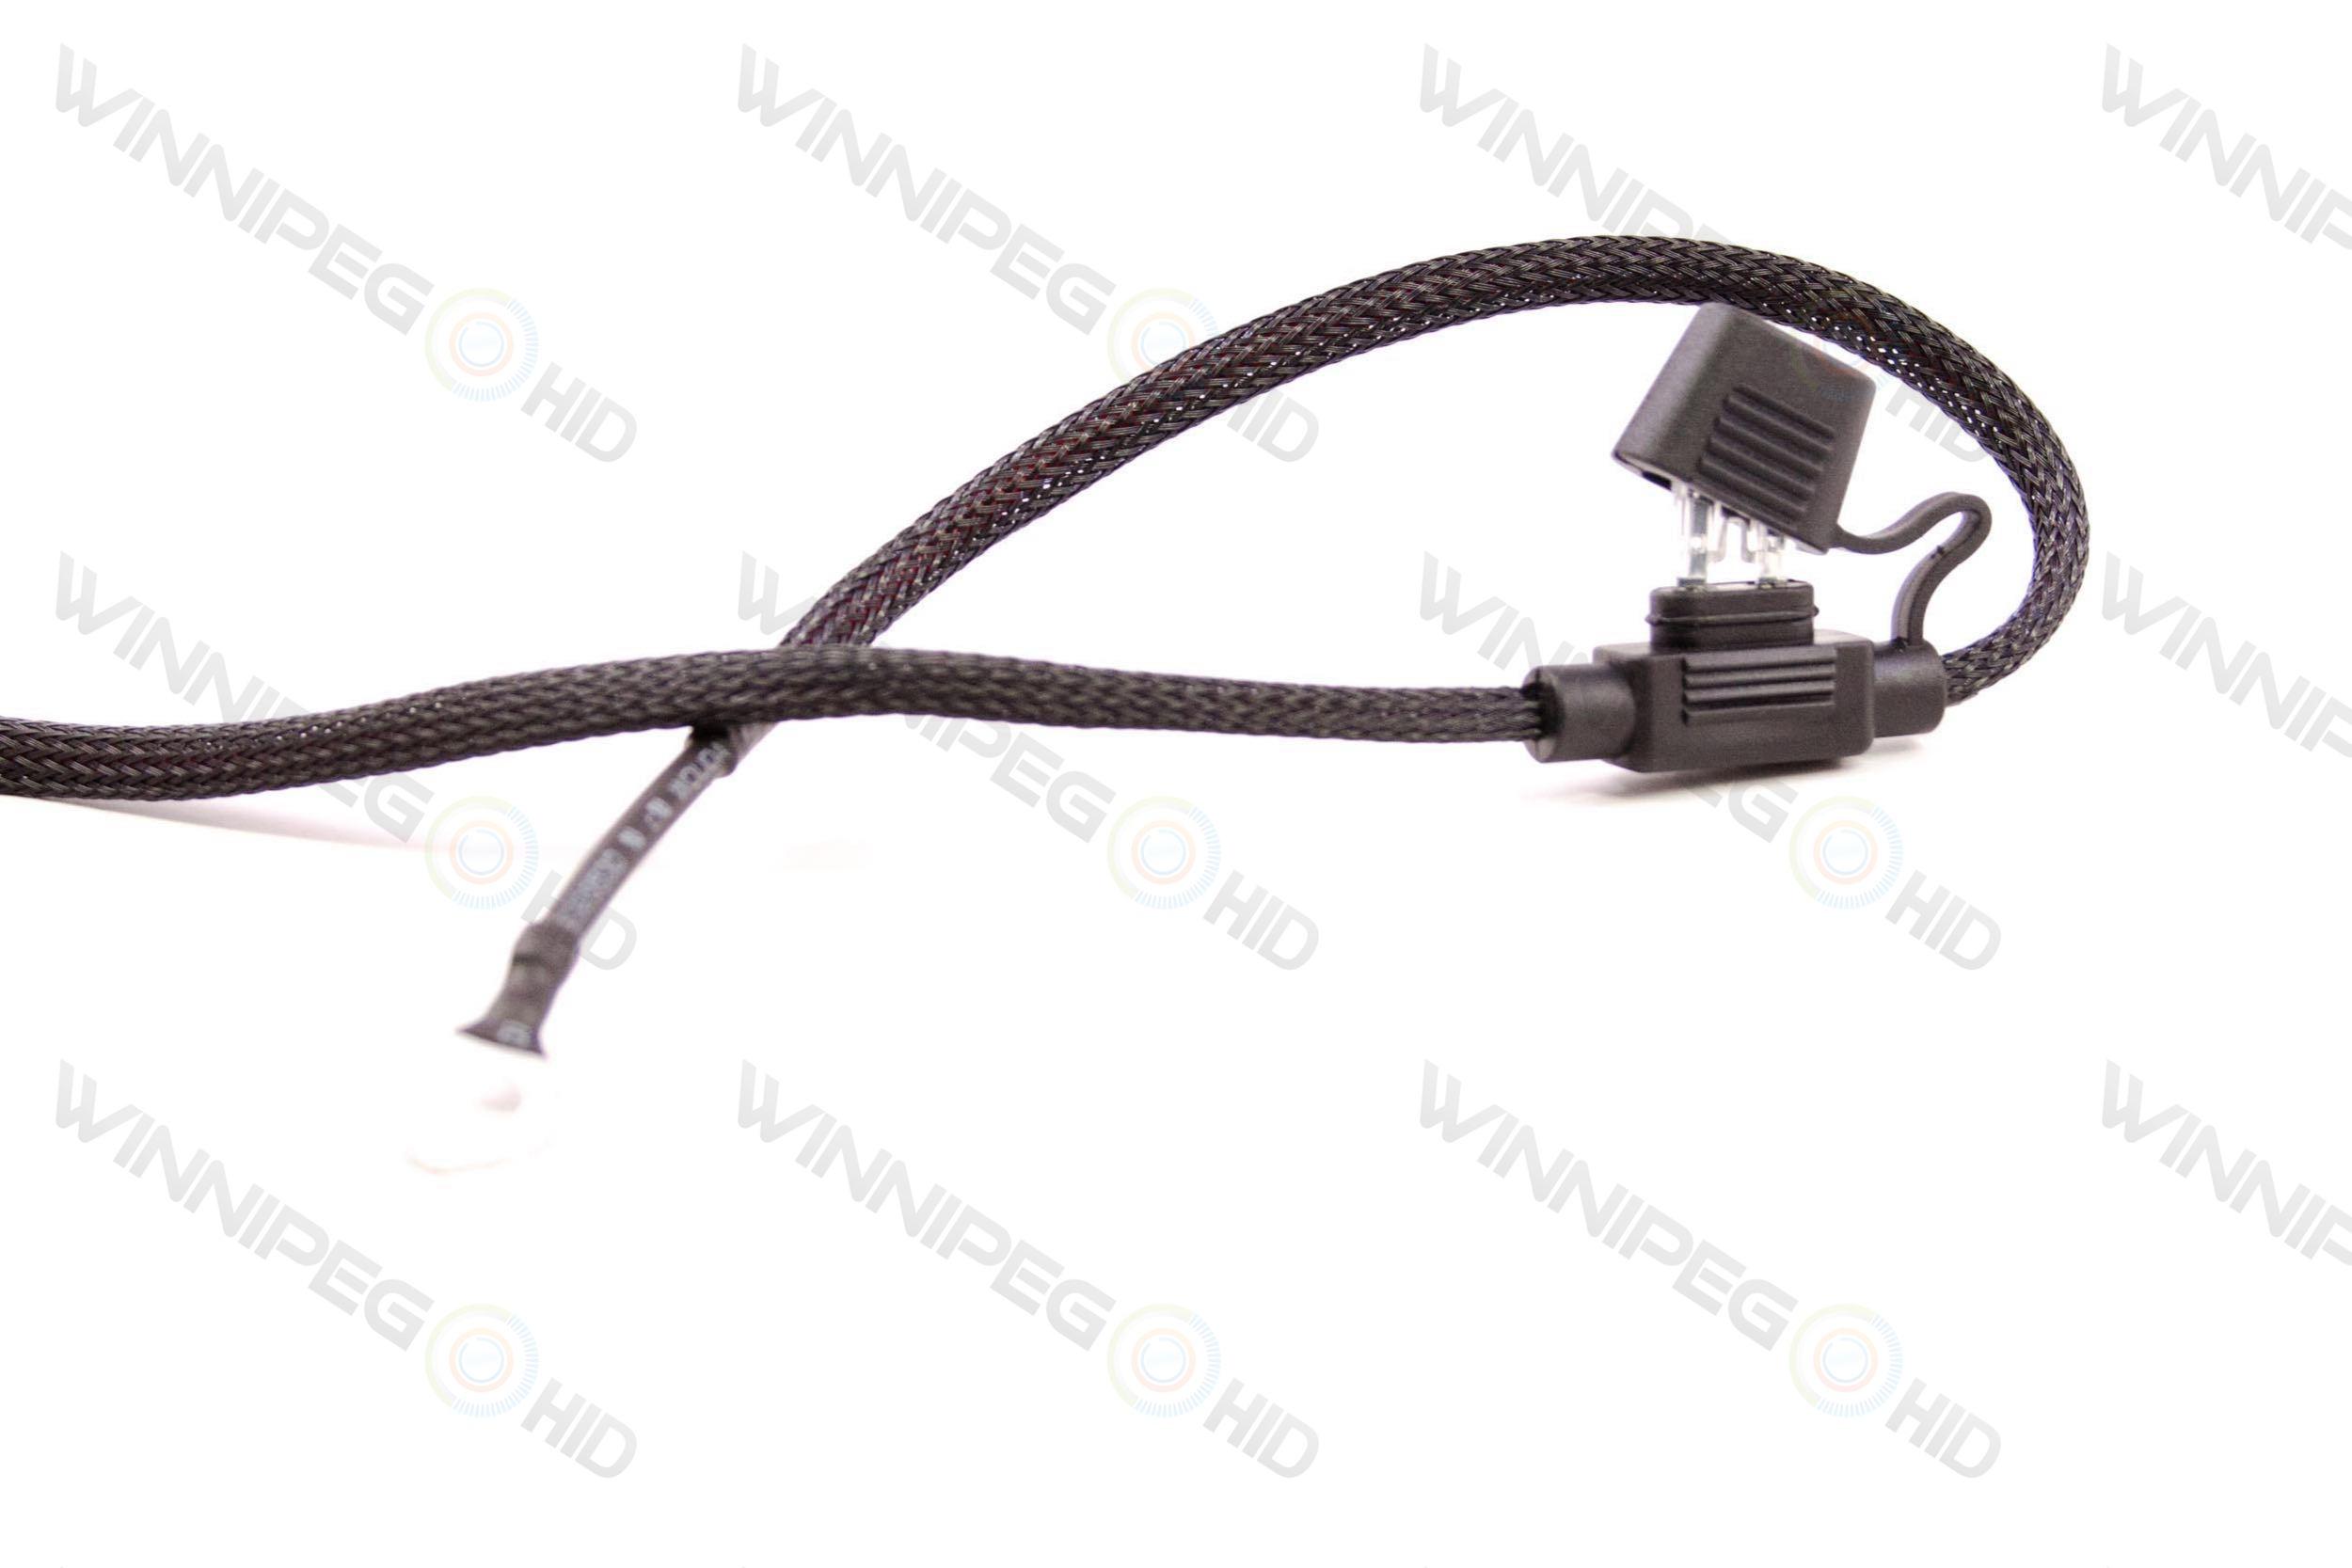 Morimoto Single Beam Hd Harness Winnipeg Hid Wiring Benchmarking 9005 9006 9012 Headlight Relay Wire 5